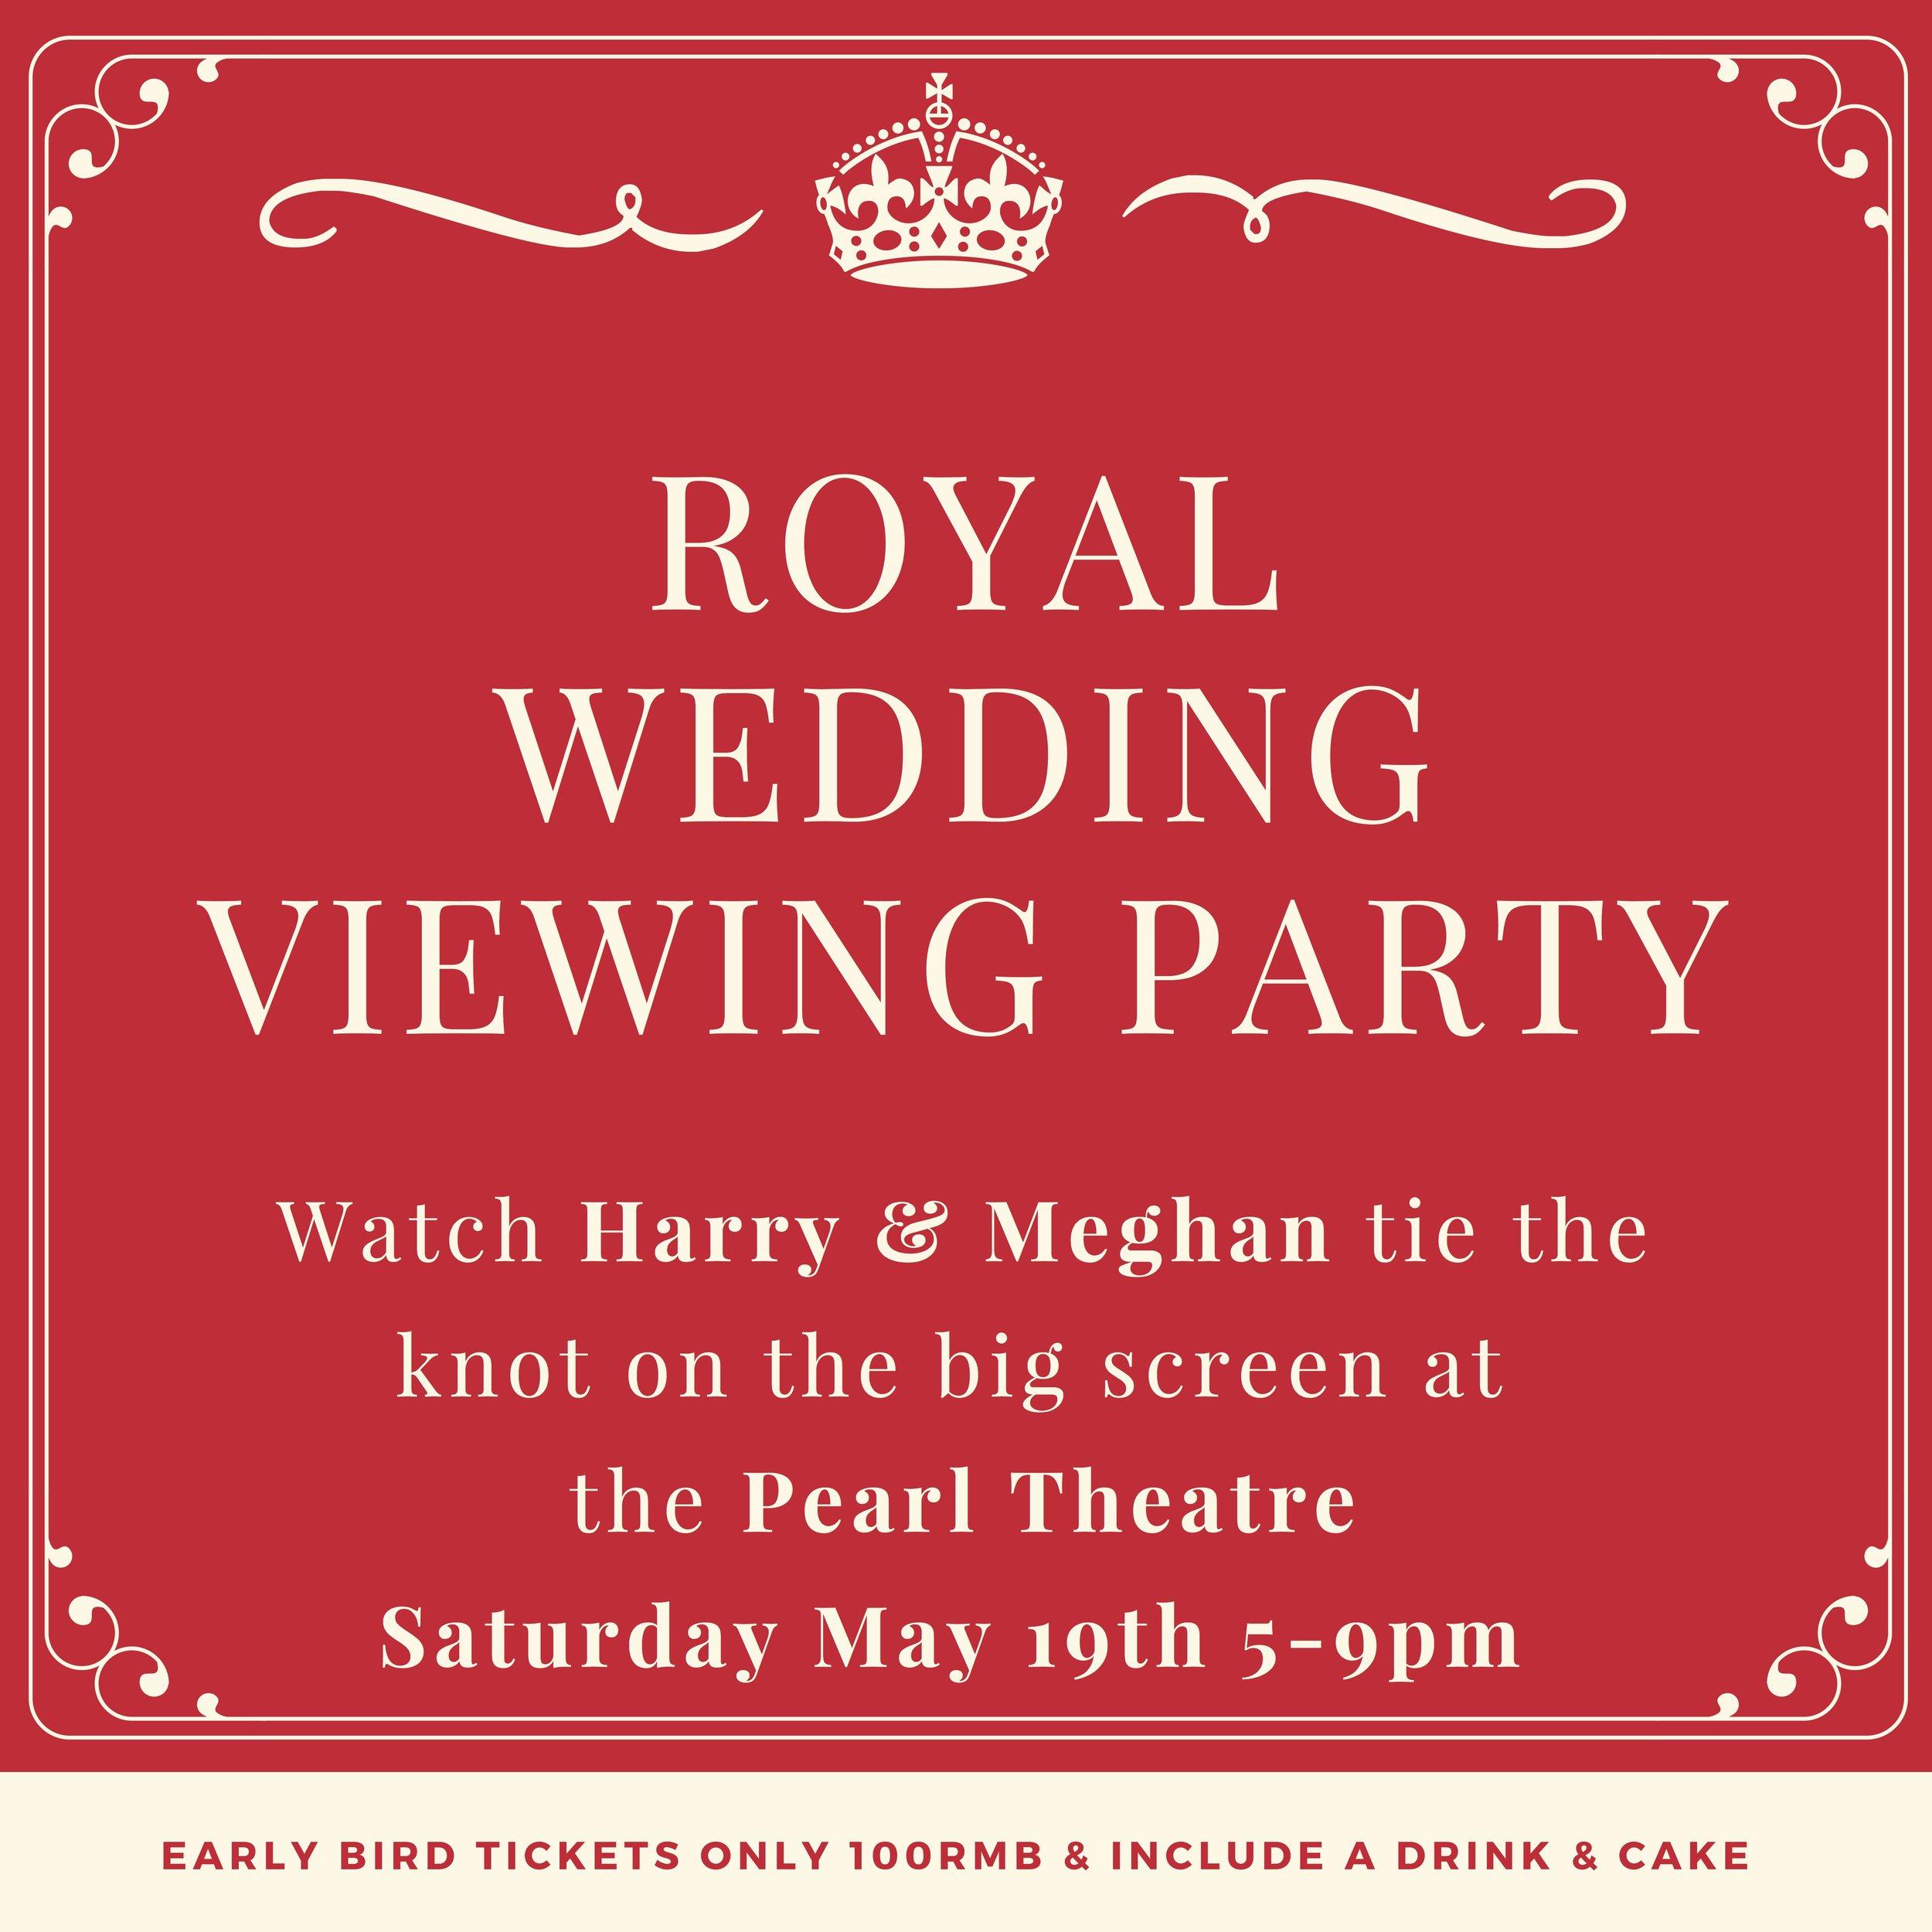 Royal Wedding Invite.jpg